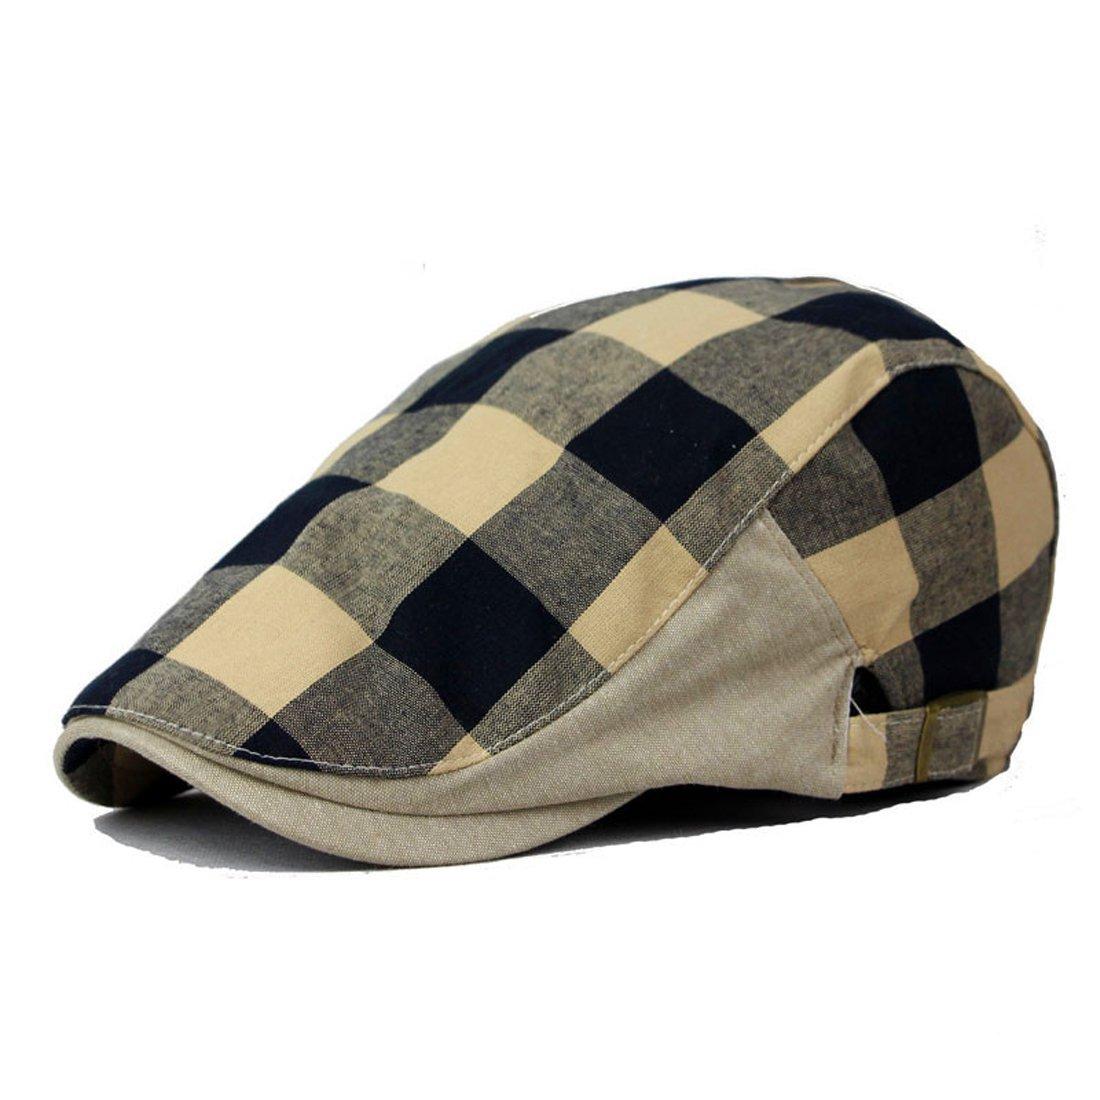 c9d56e22a9826 Belsen Unisex Cotton Linen Cabbie Gatsby Hat Golf Ivy Newsboy Driving Cap  (Black) at Amazon Men s Clothing store